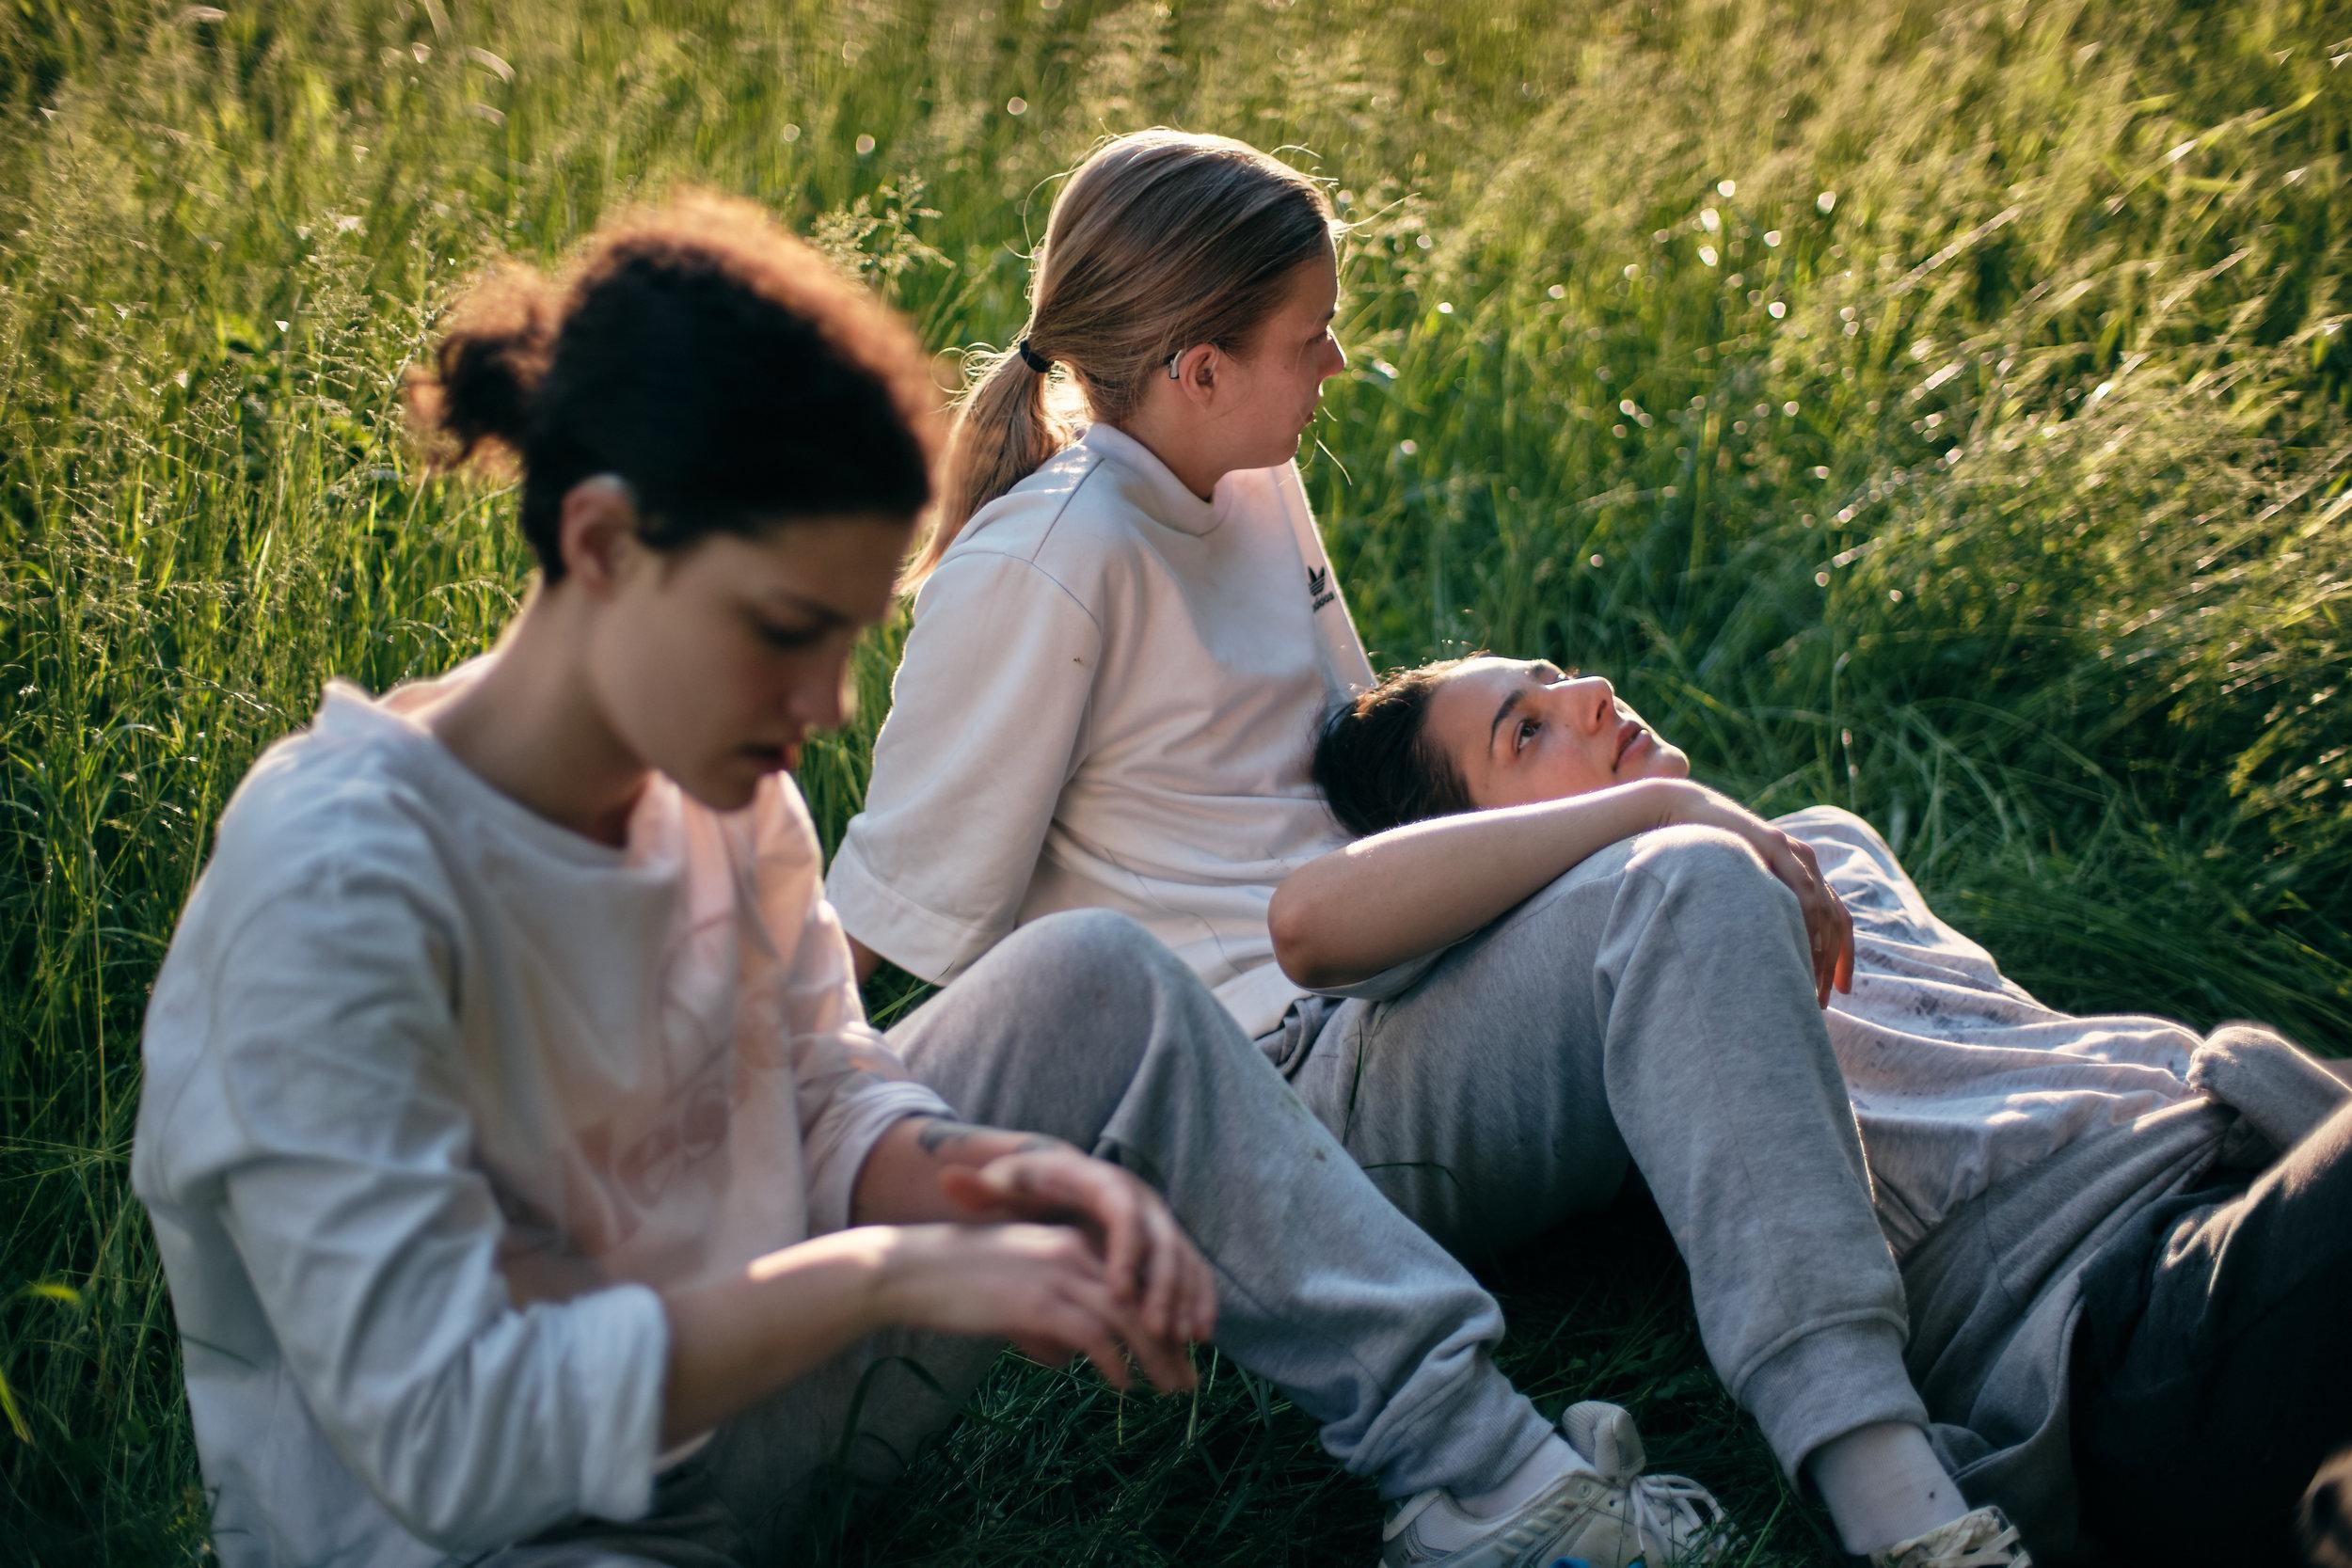 'Sestre' (2019)    Production: A Atalanta    Director: Katarina Resek Kukla    DOP: Peter Perunovic    In frame: Mina Milovanovic, Mia Skrbinac, Sarah Al Saleh